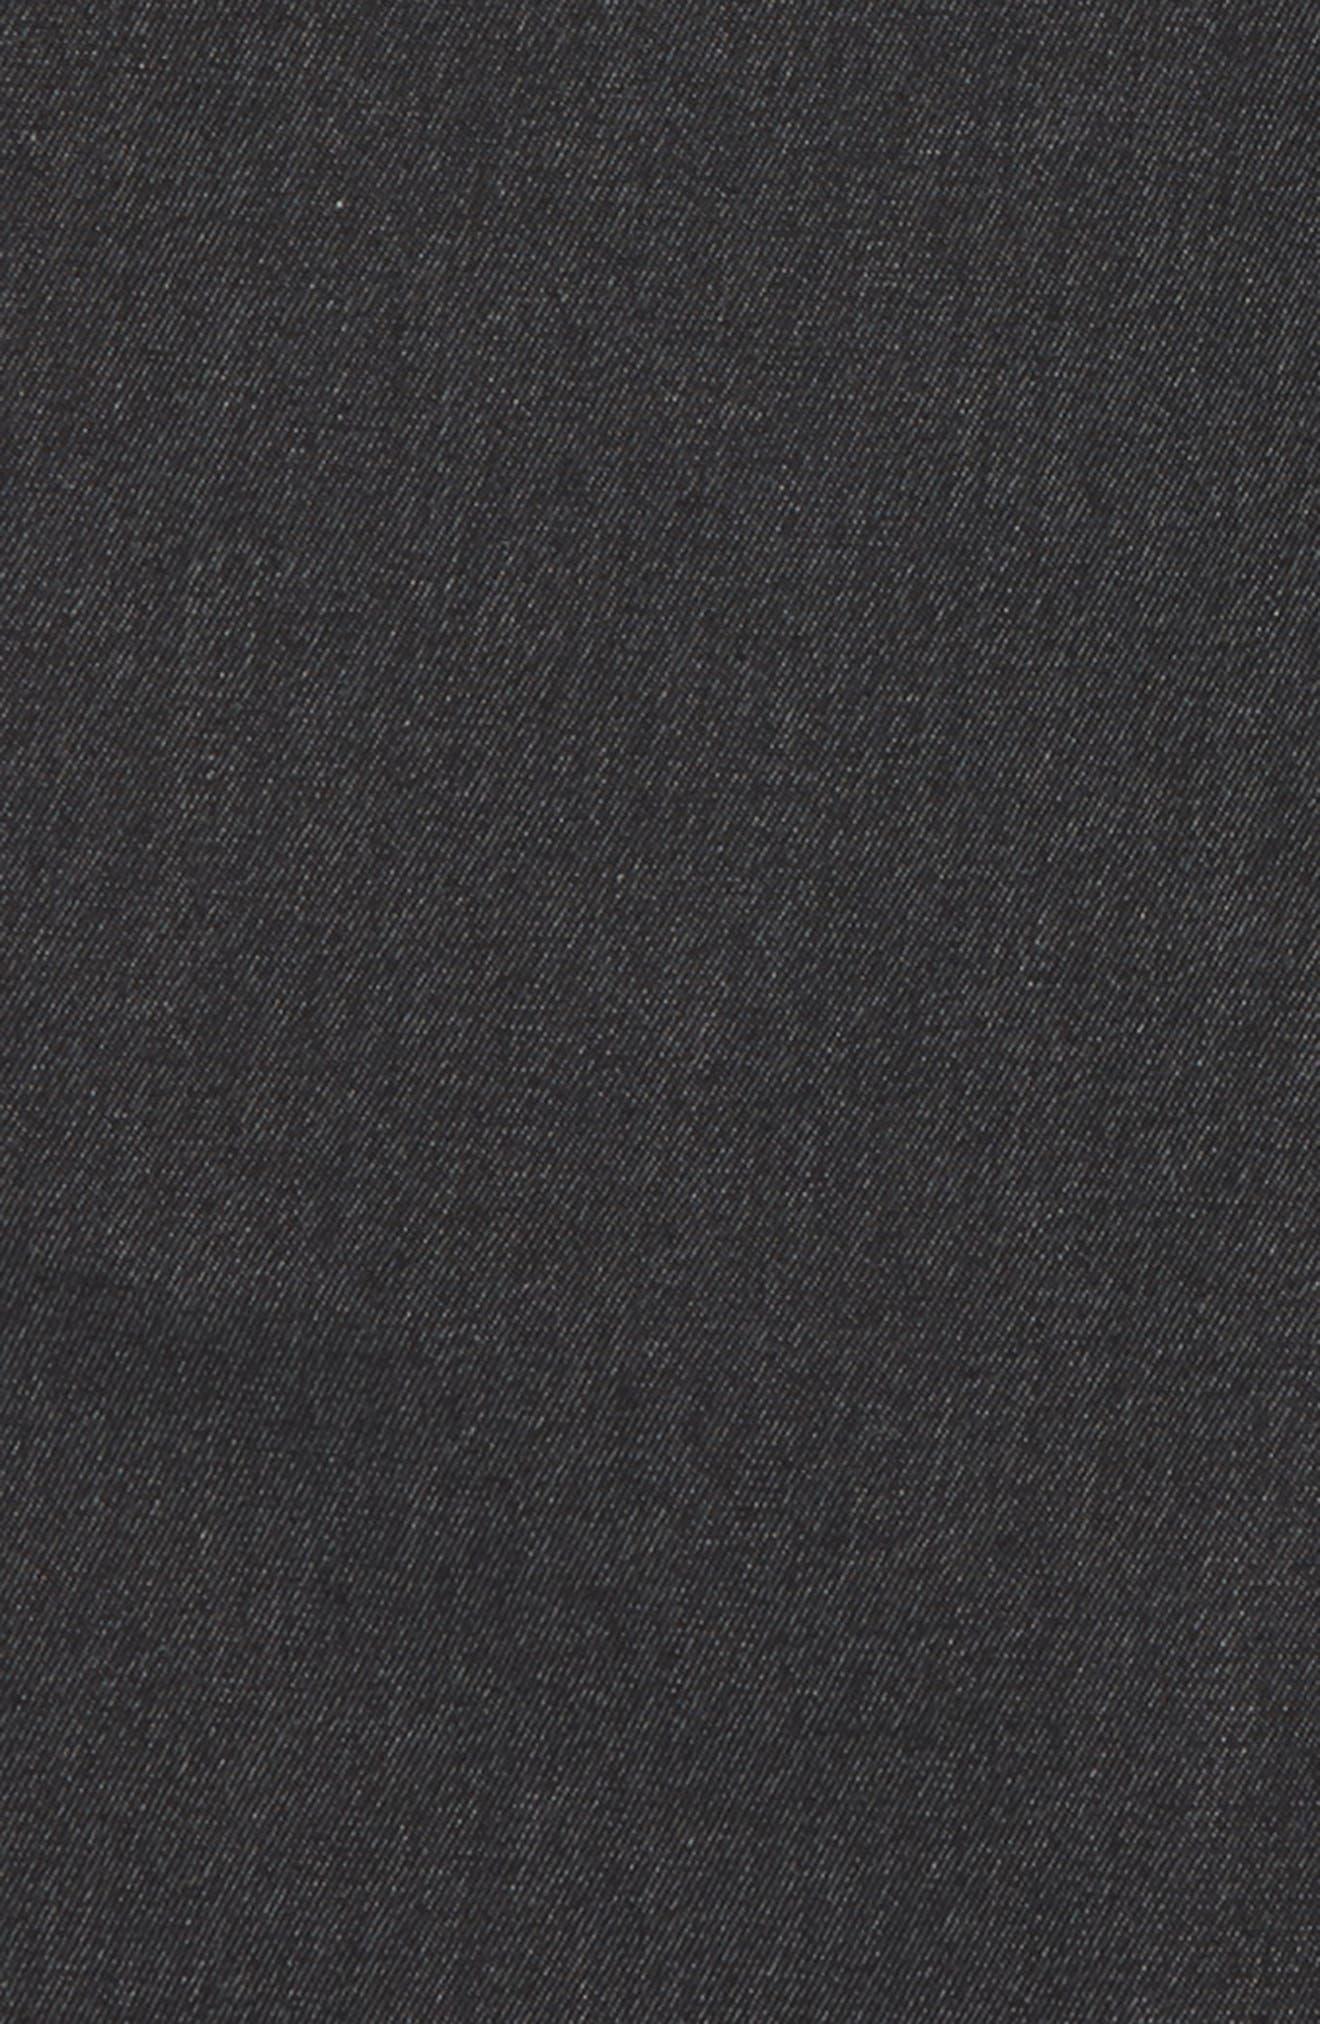 'Carter' Cotton Twill Shorts,                             Alternate thumbnail 2, color,                             001